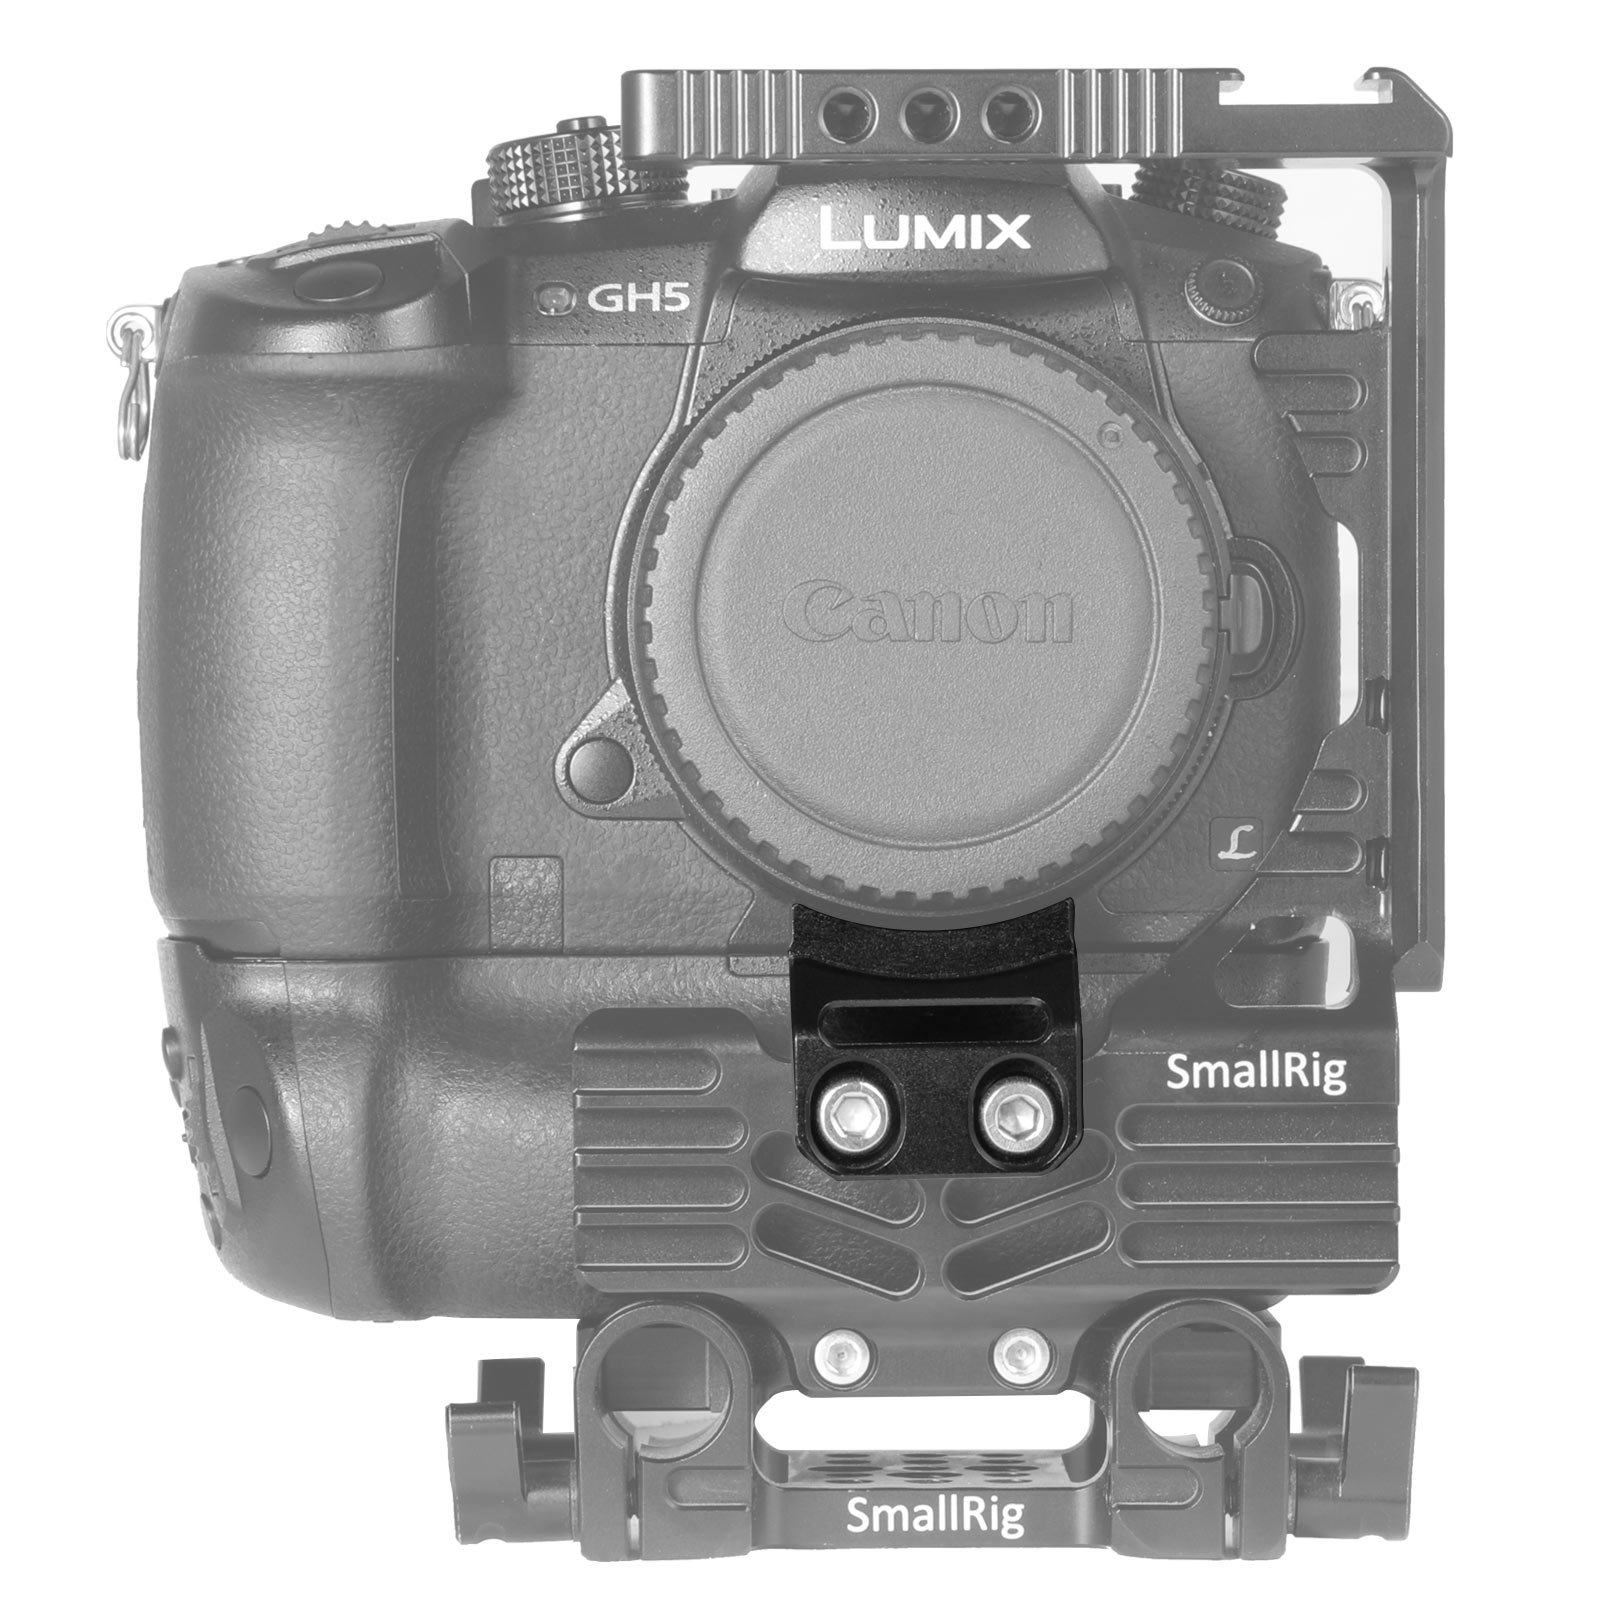 SmallRig GH5 Lens Adapter Support Bracket Lens Mount Converter Support Stabilization Camera Rig (Special Smallrig Half Cage 2024/2025/2067) - 2073 by SmallRig